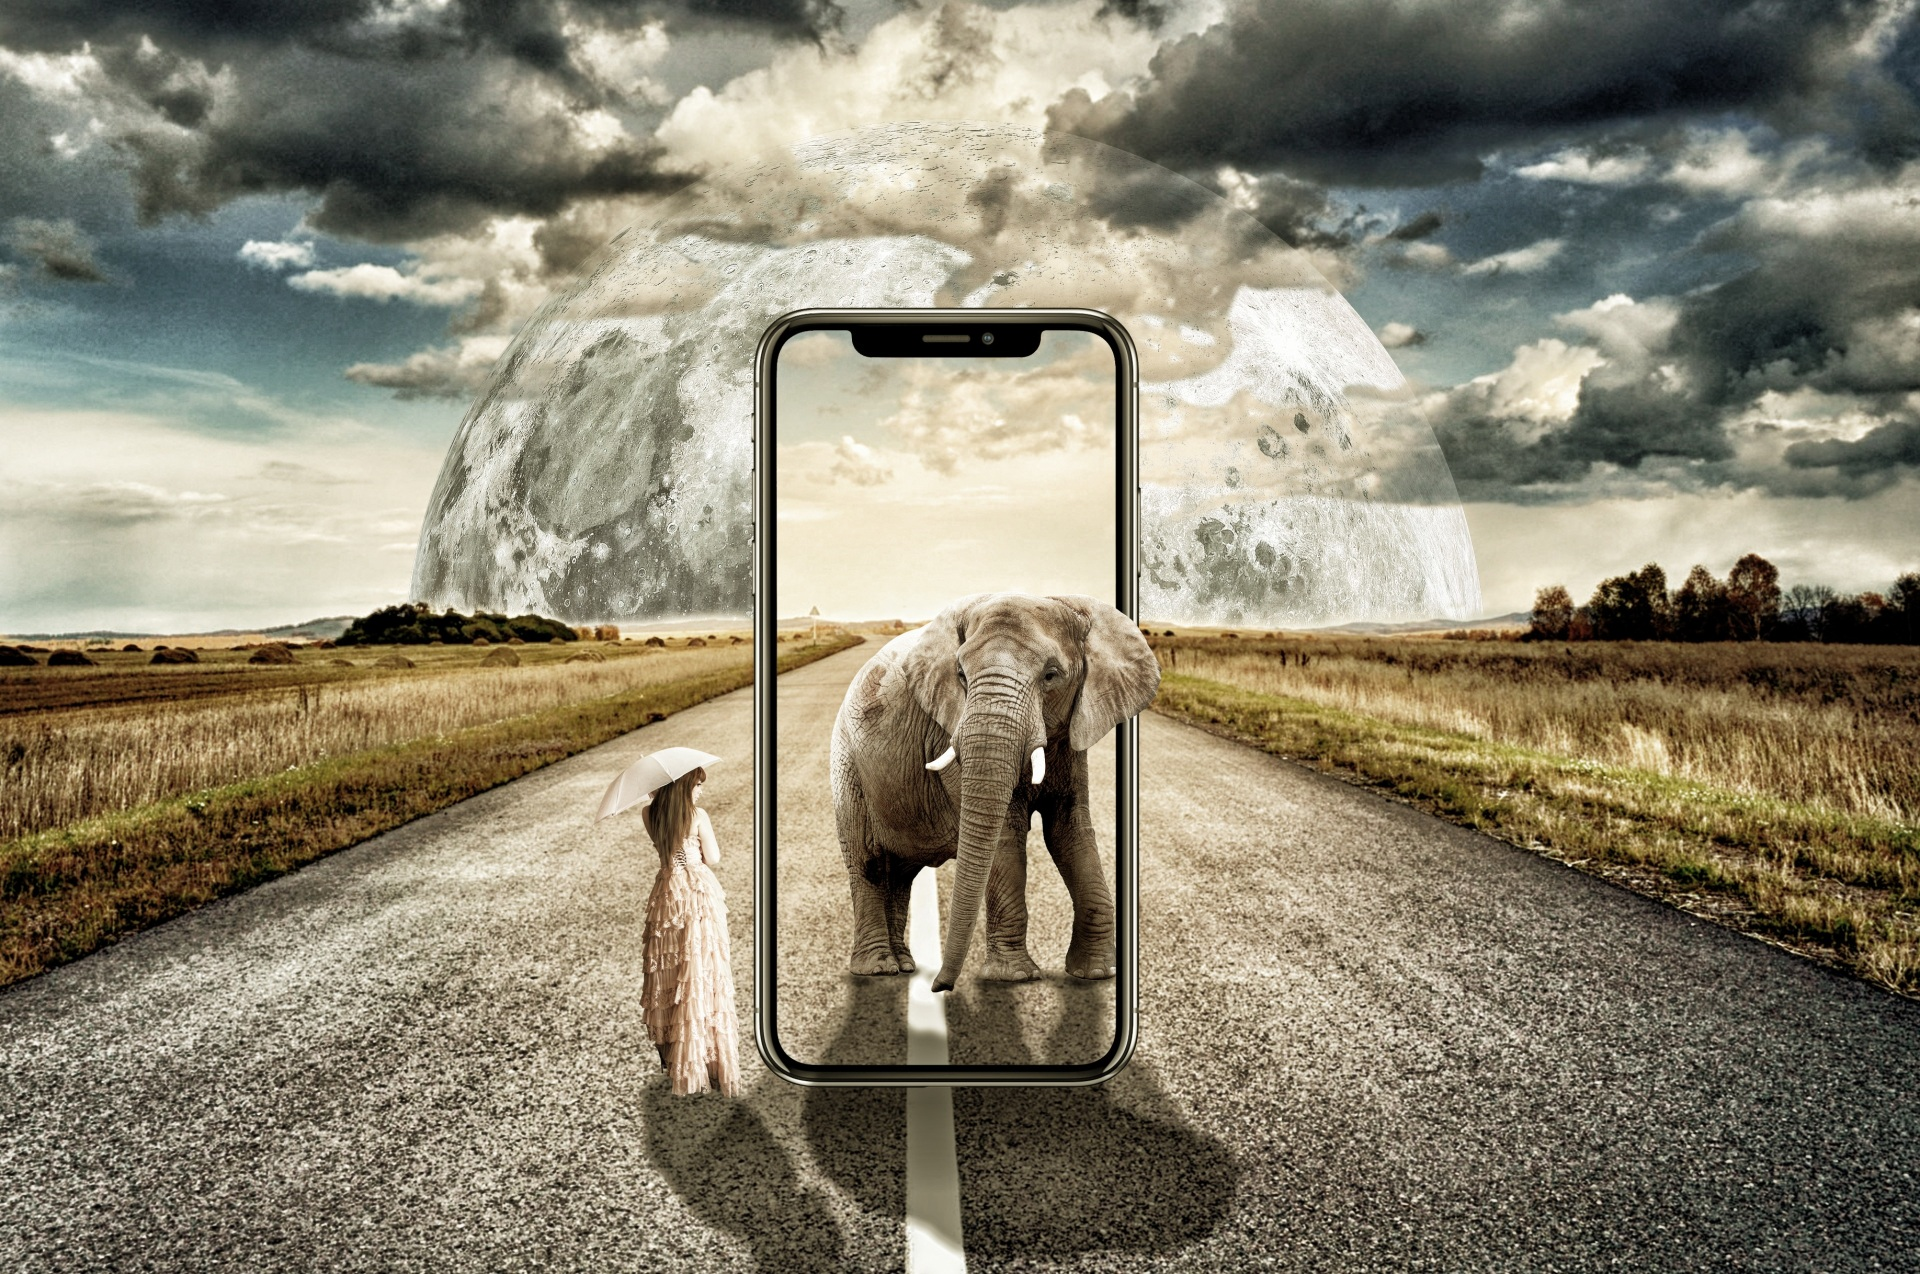 iphone-x-2957273